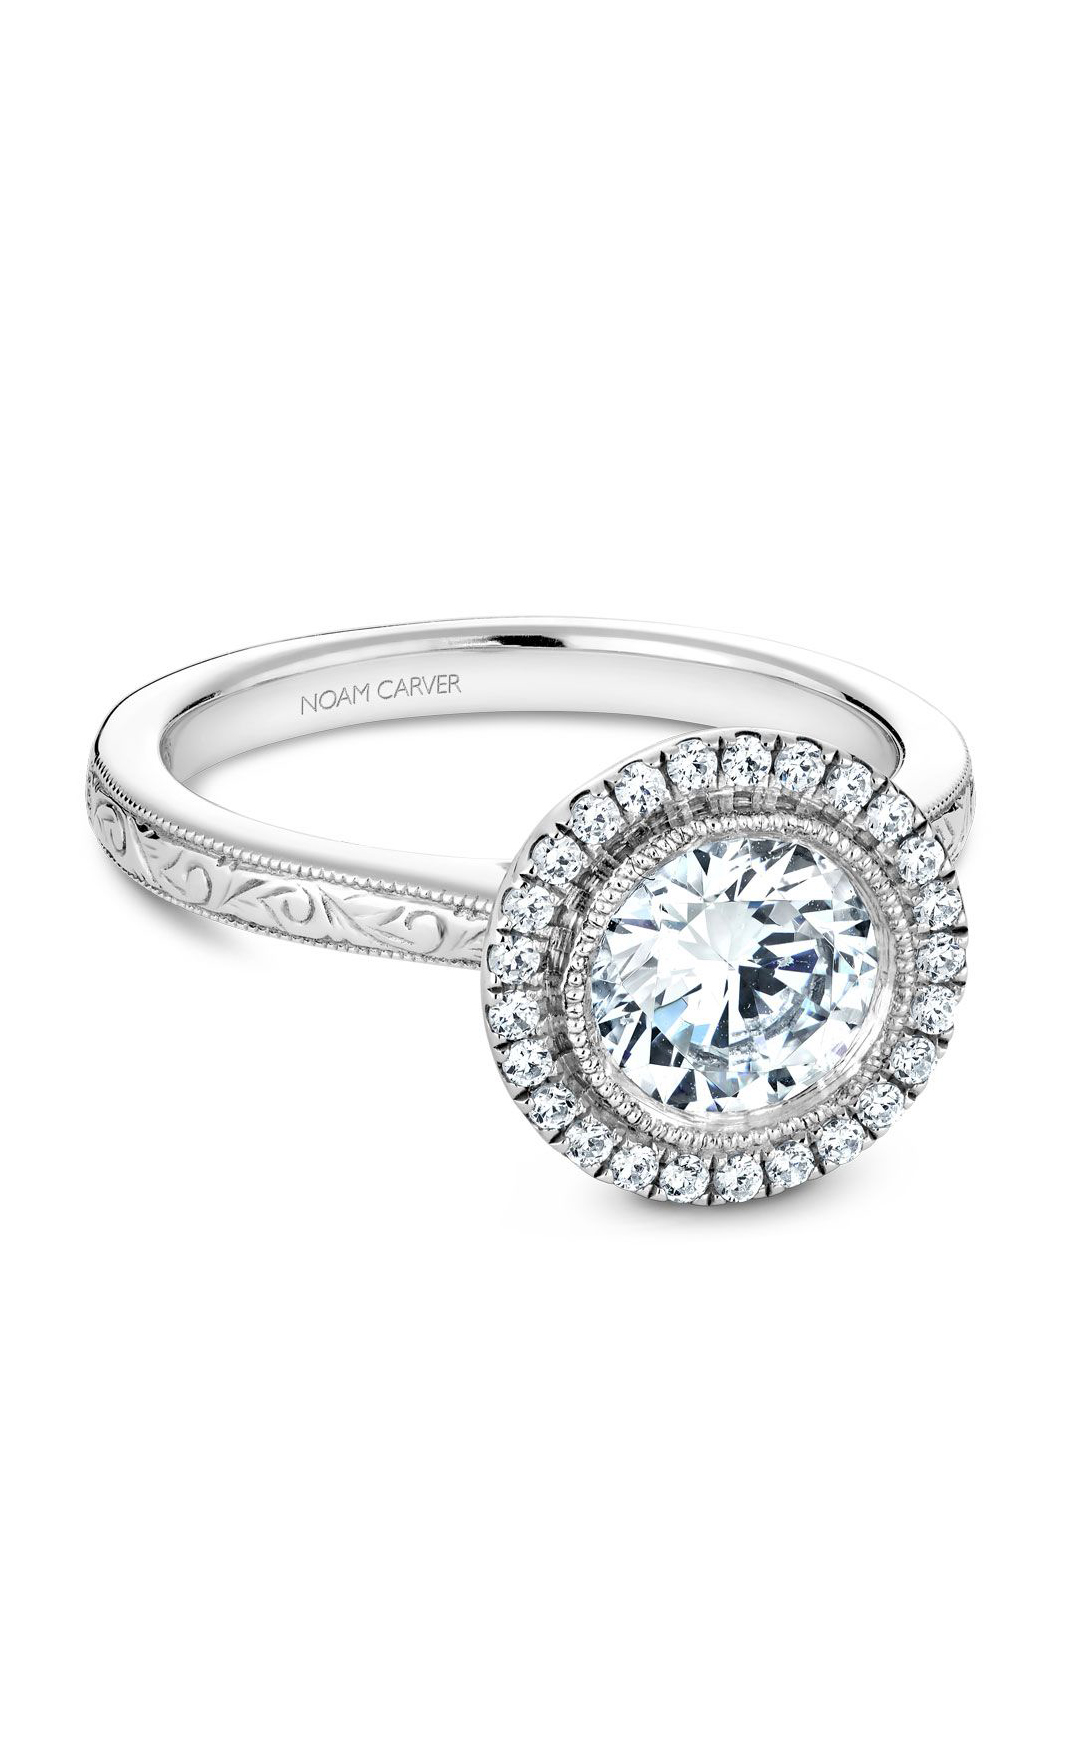 Noam Carver Floral Engagement Ring B140-15EA product image